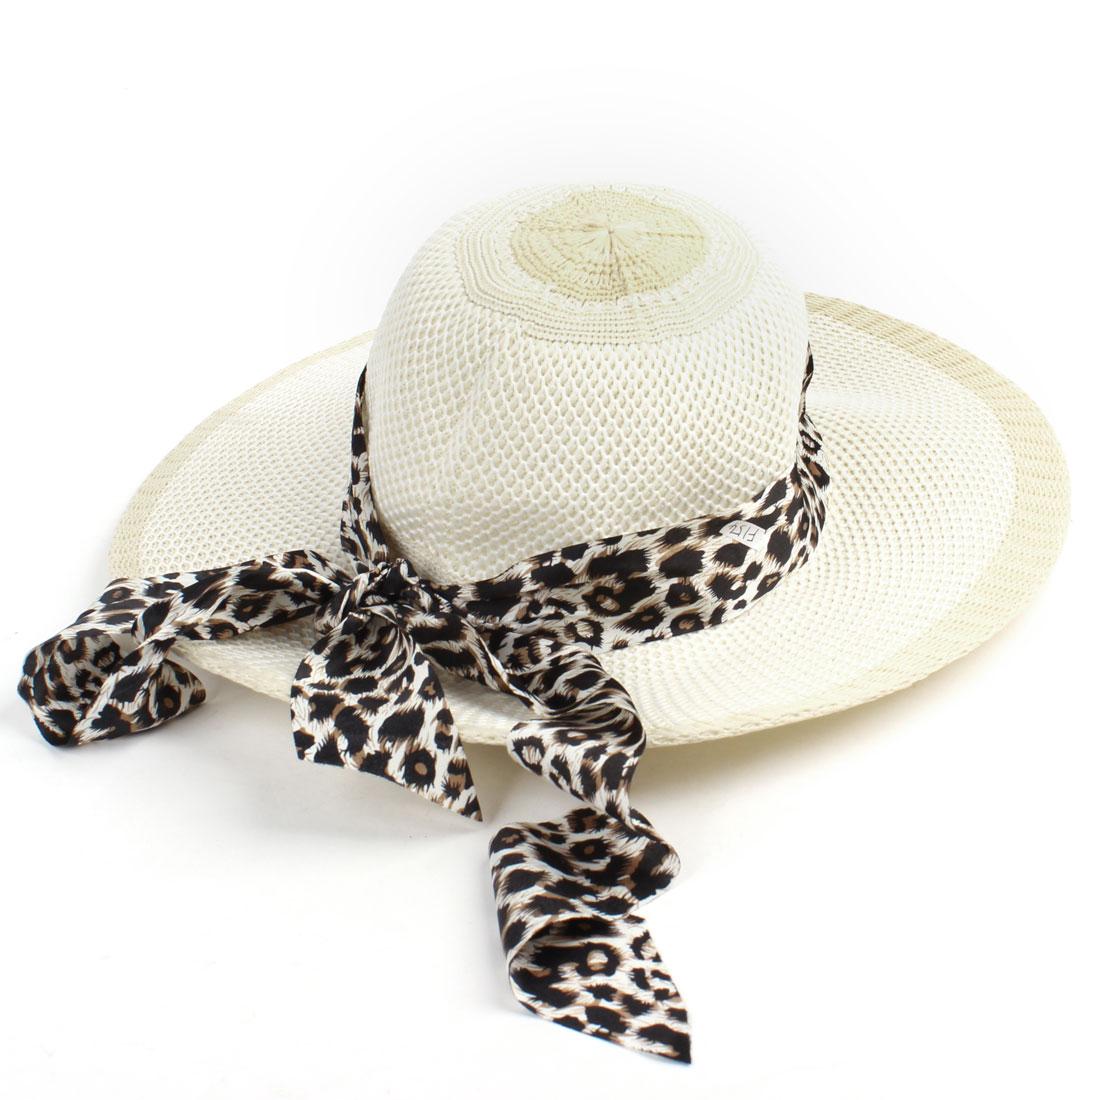 Head Wear Leopard Printed Band Linen Braided Cap Hat Beige for Ladies